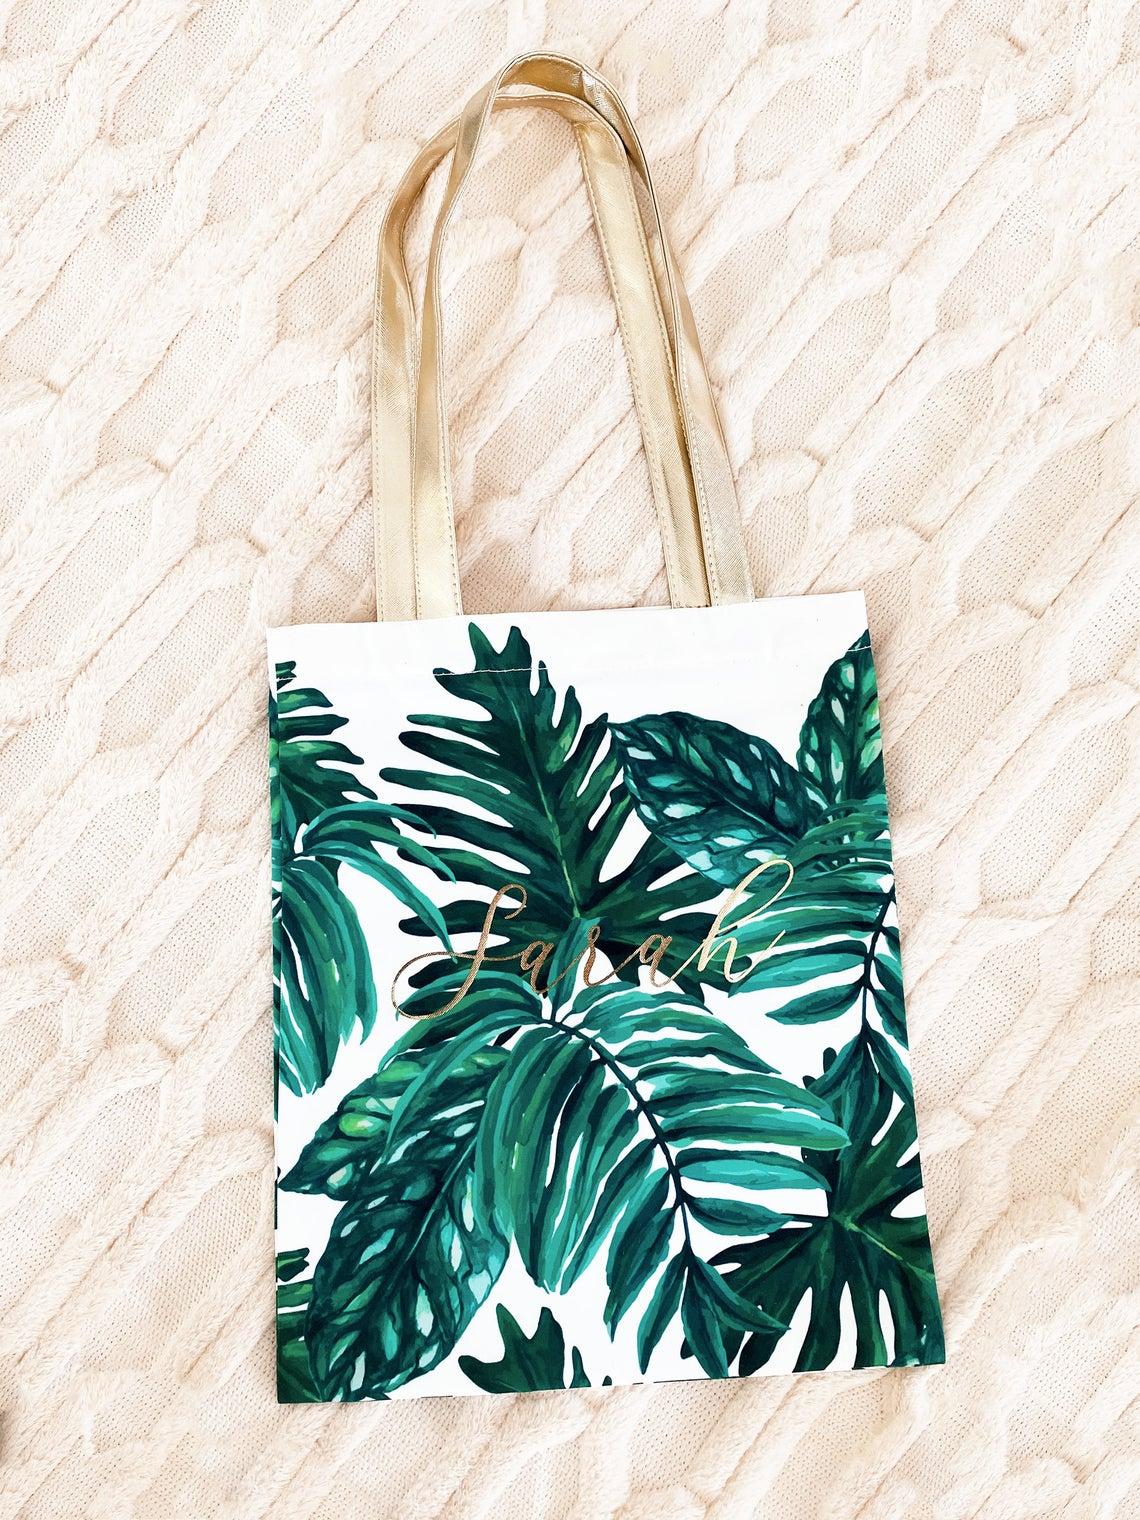 Palm Leaf Tote Bags Personalized Tote Bag Tropical Tote Bag Tropical Bachelorette Beach Bridesmaid Gift EB3293PLM